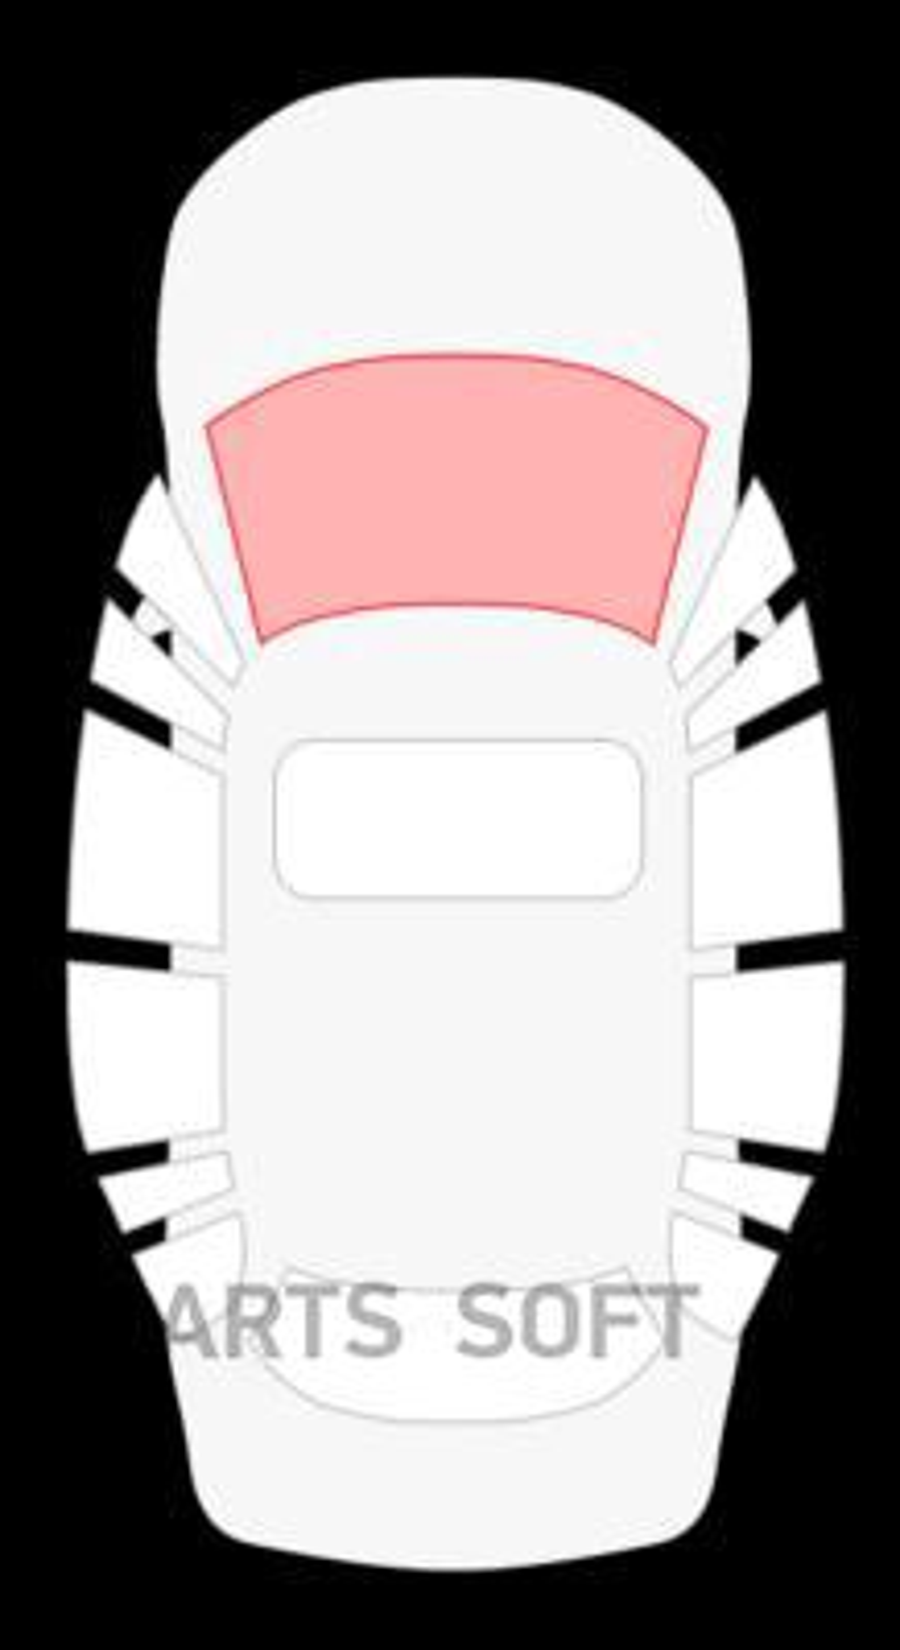 Honda Accord CF3/CF4/CF5 4D седан (97-01) / CF6/CF7 5D универсал (97-02) / Torneo CF3 4D седан (00-)